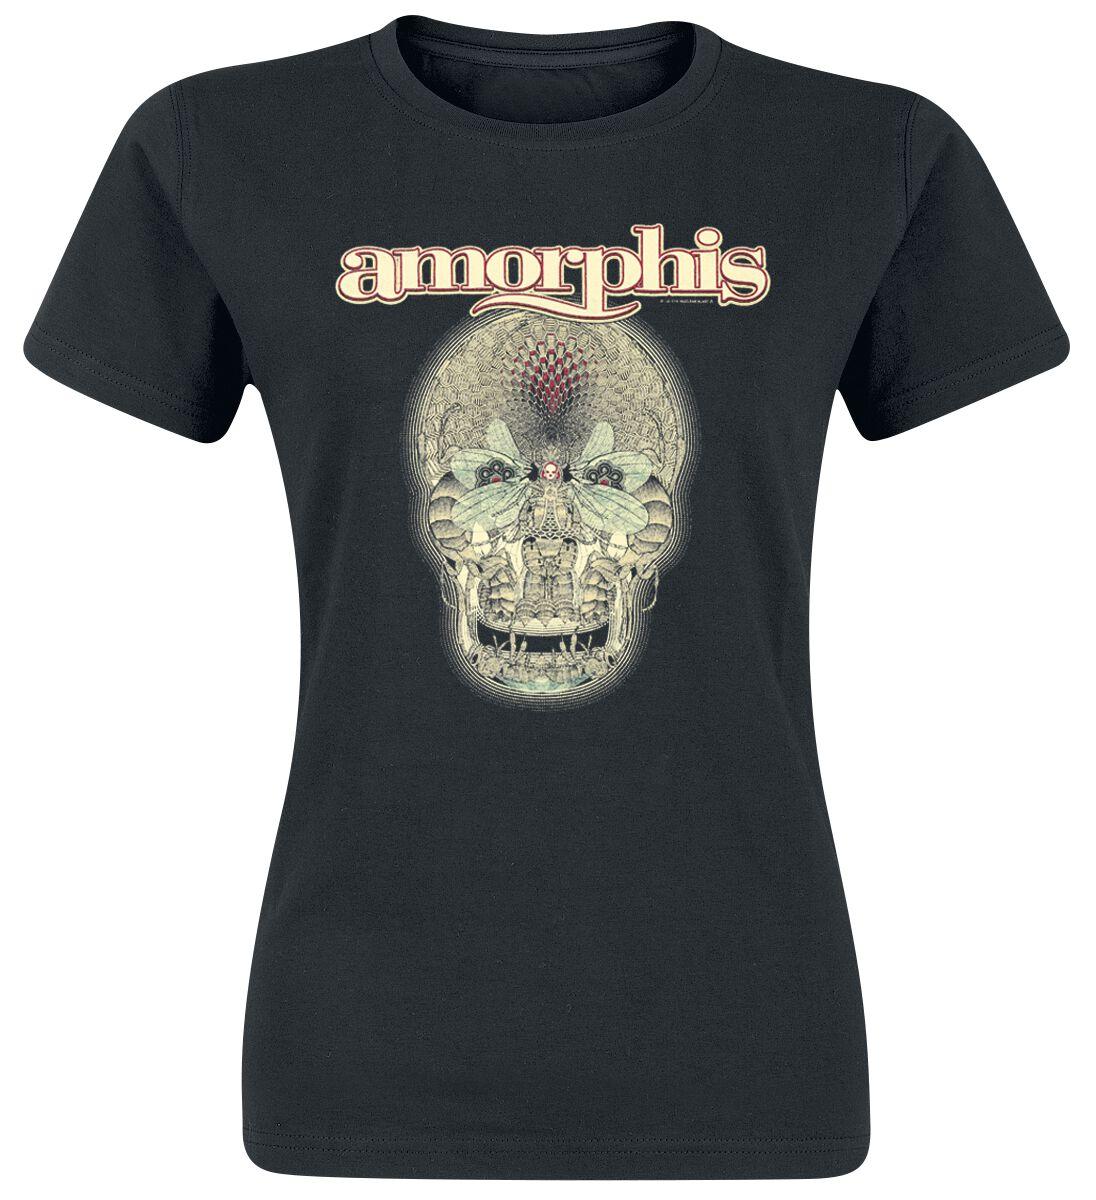 Amorphis Queen of time Koszulka damska czarny